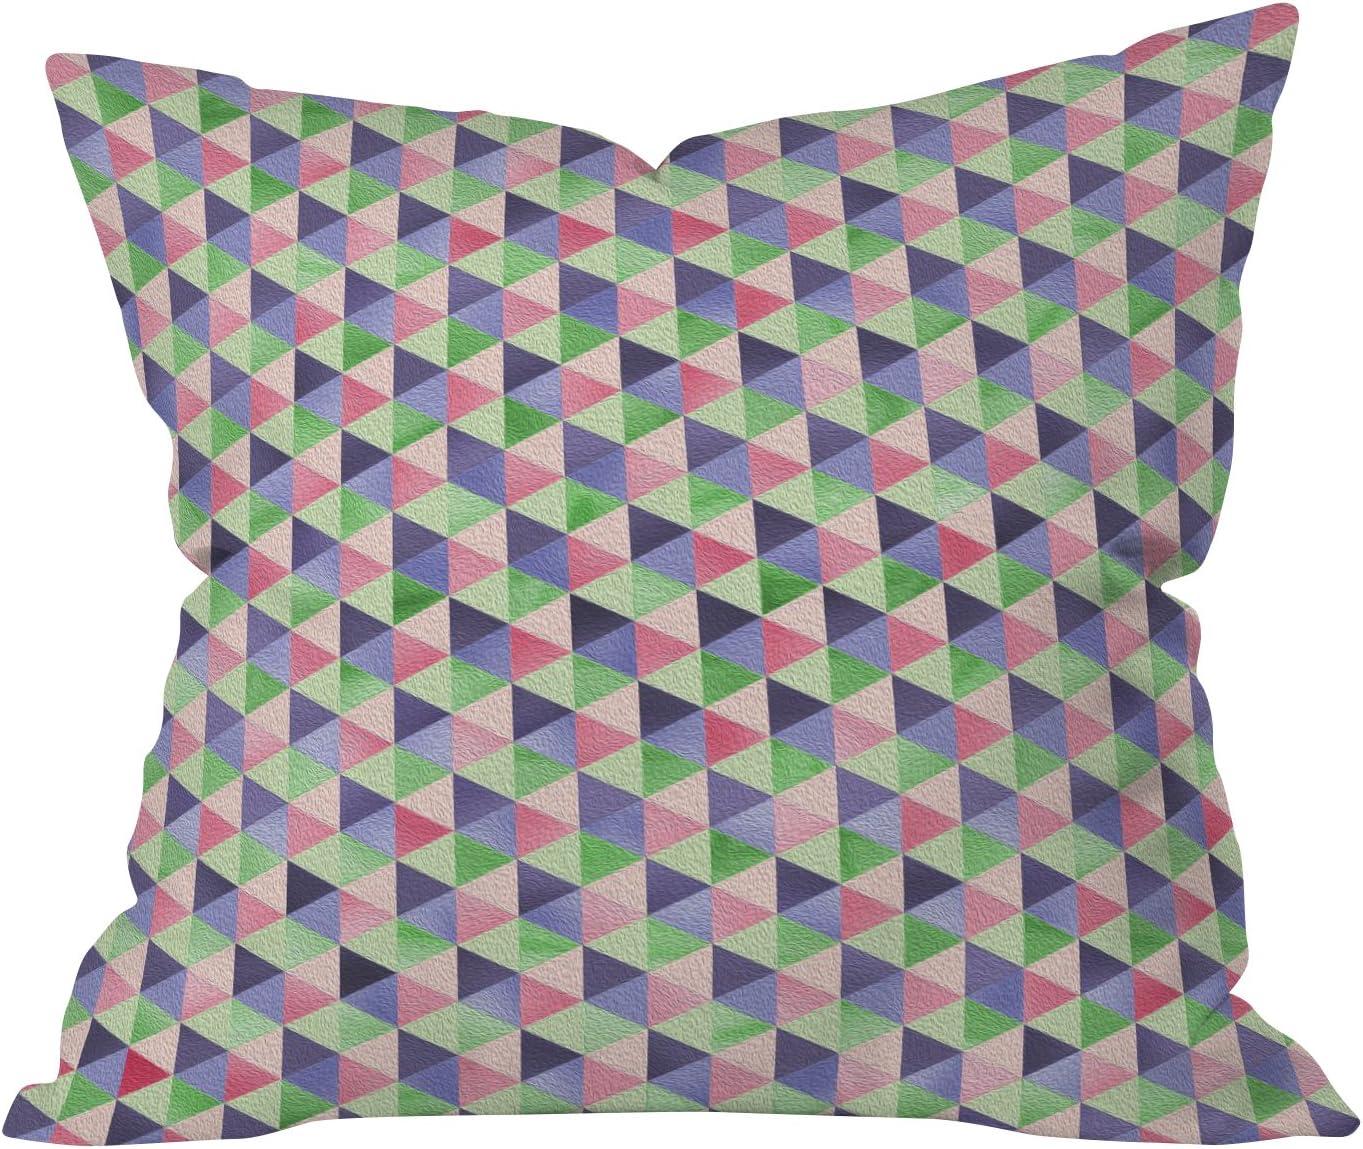 Deny Designs Lara Kulpa Retro Cubic Summer Throw Pillow, 26 x 26